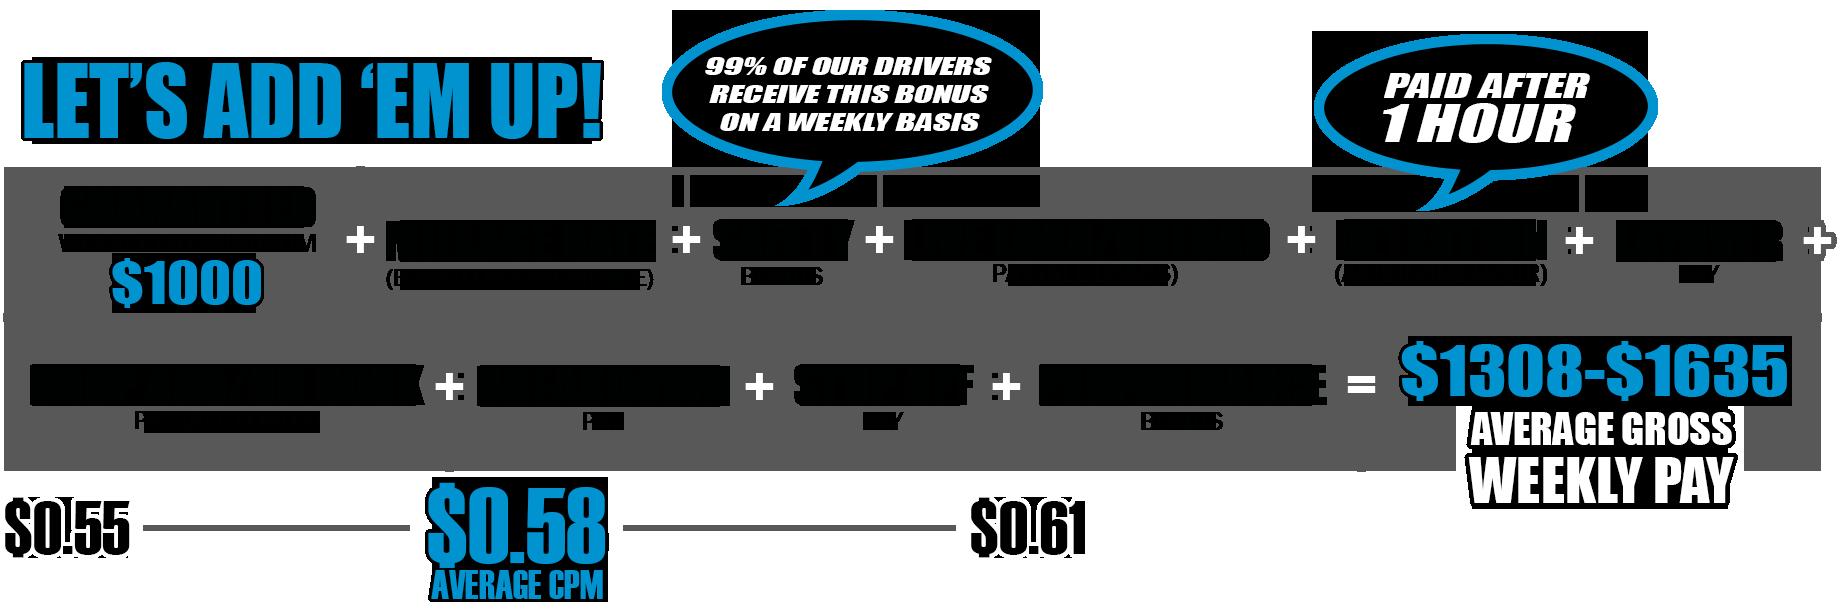 Keller Trucking Regional Truck Driver Pay Package